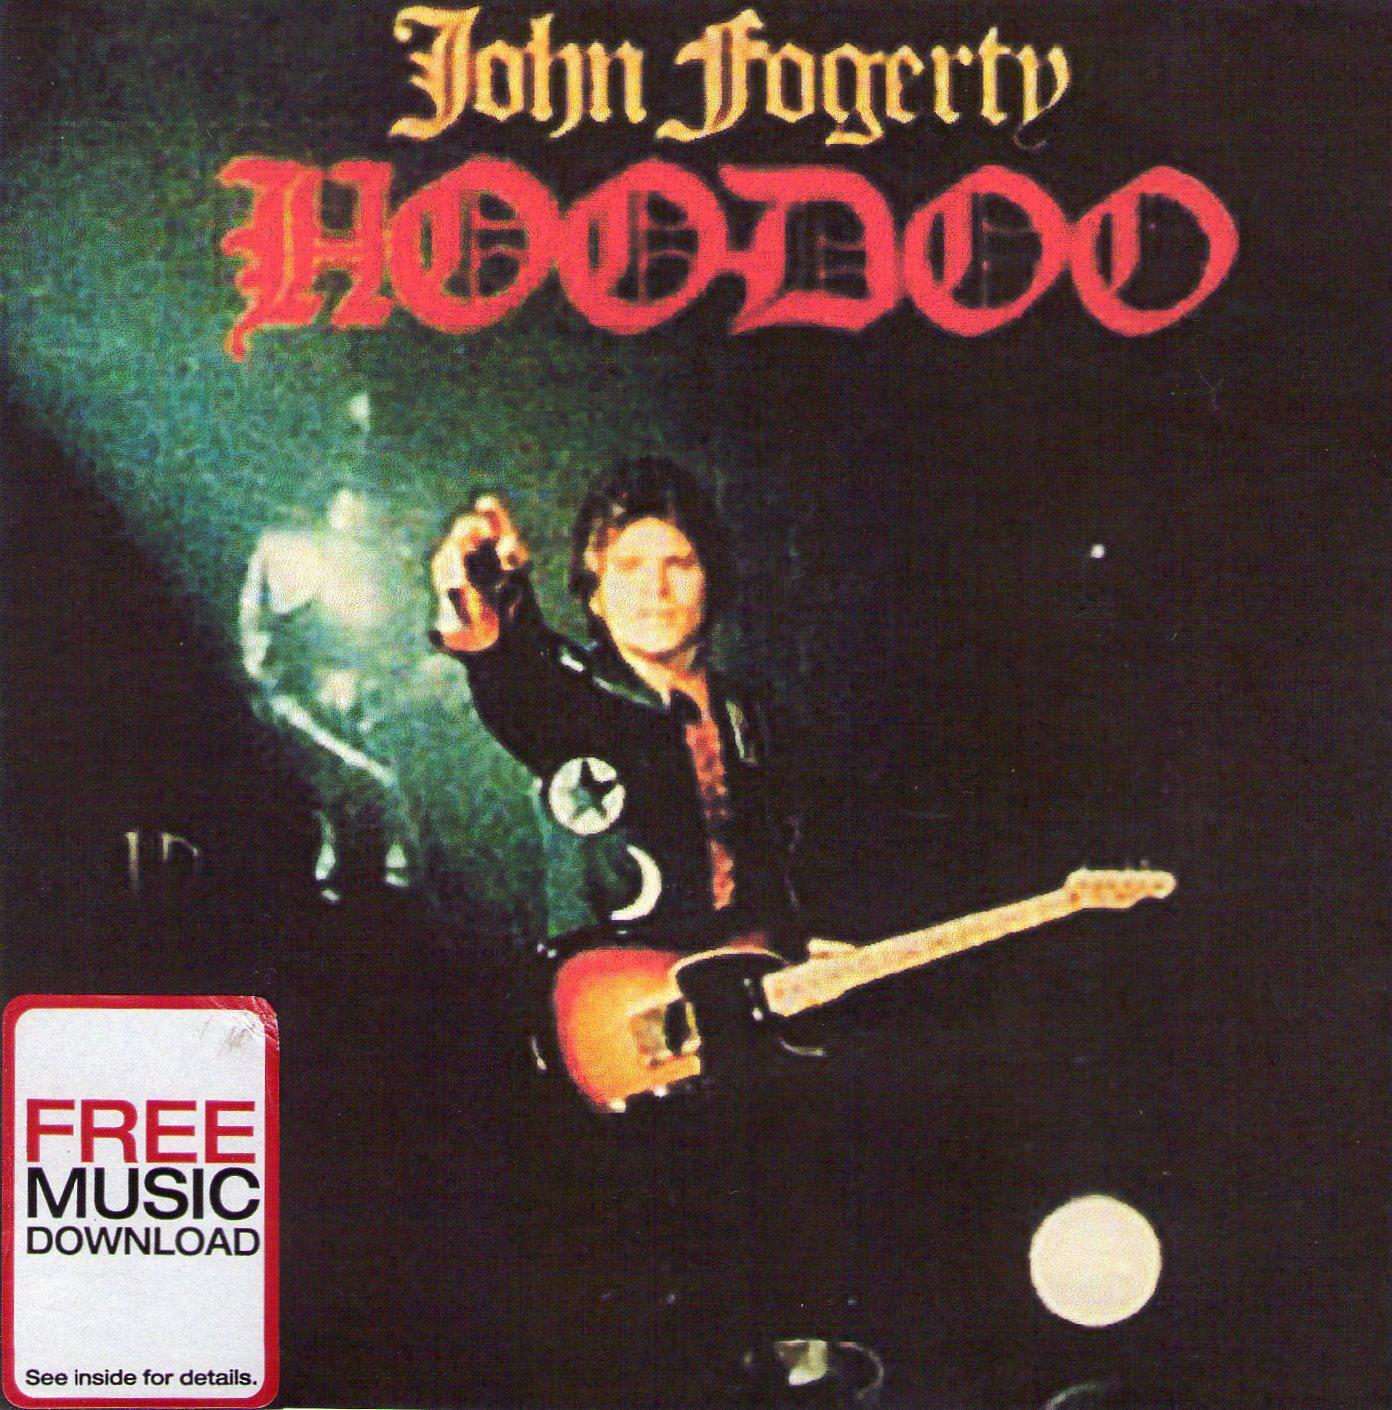 John Fogerty - Página 2 616667_453610737993023_190584491_o